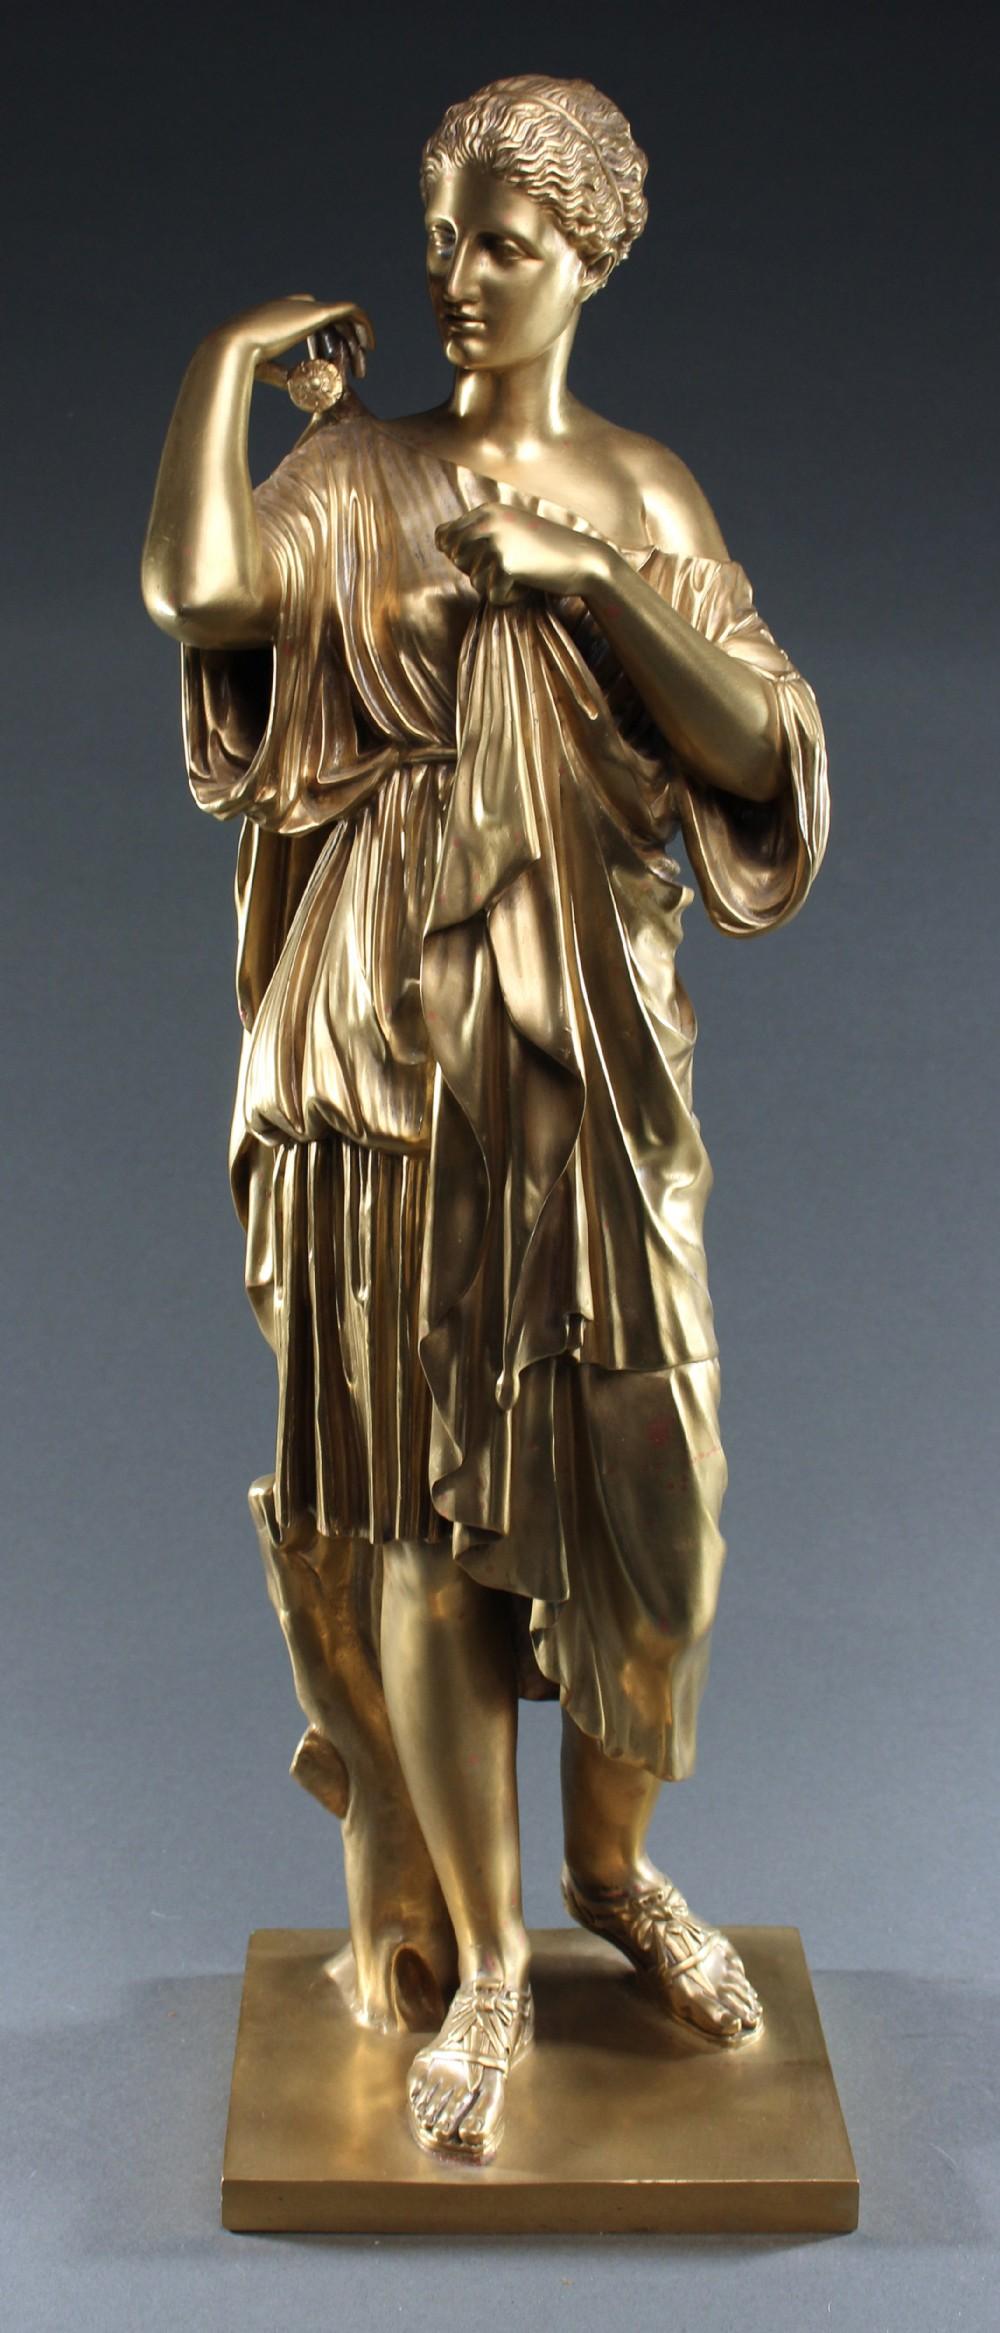 large bronze sculpture of the diane de gabies